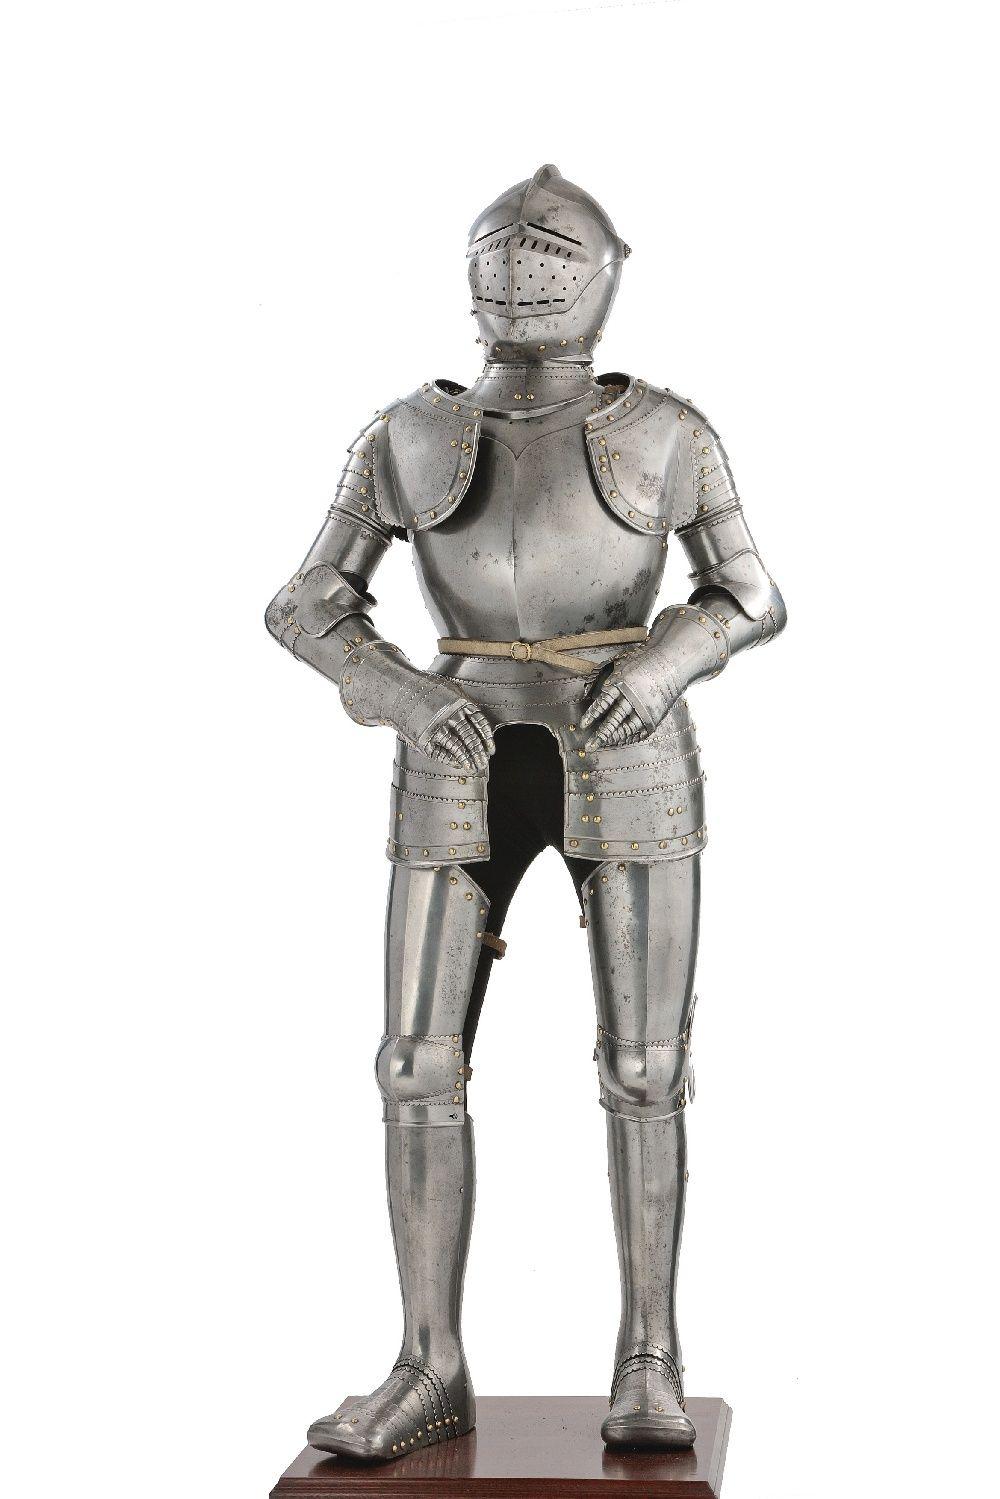 033050tf0c9t9lt9t0h28z.jpg (1000×1499)   Suits of Armor   Pinterest